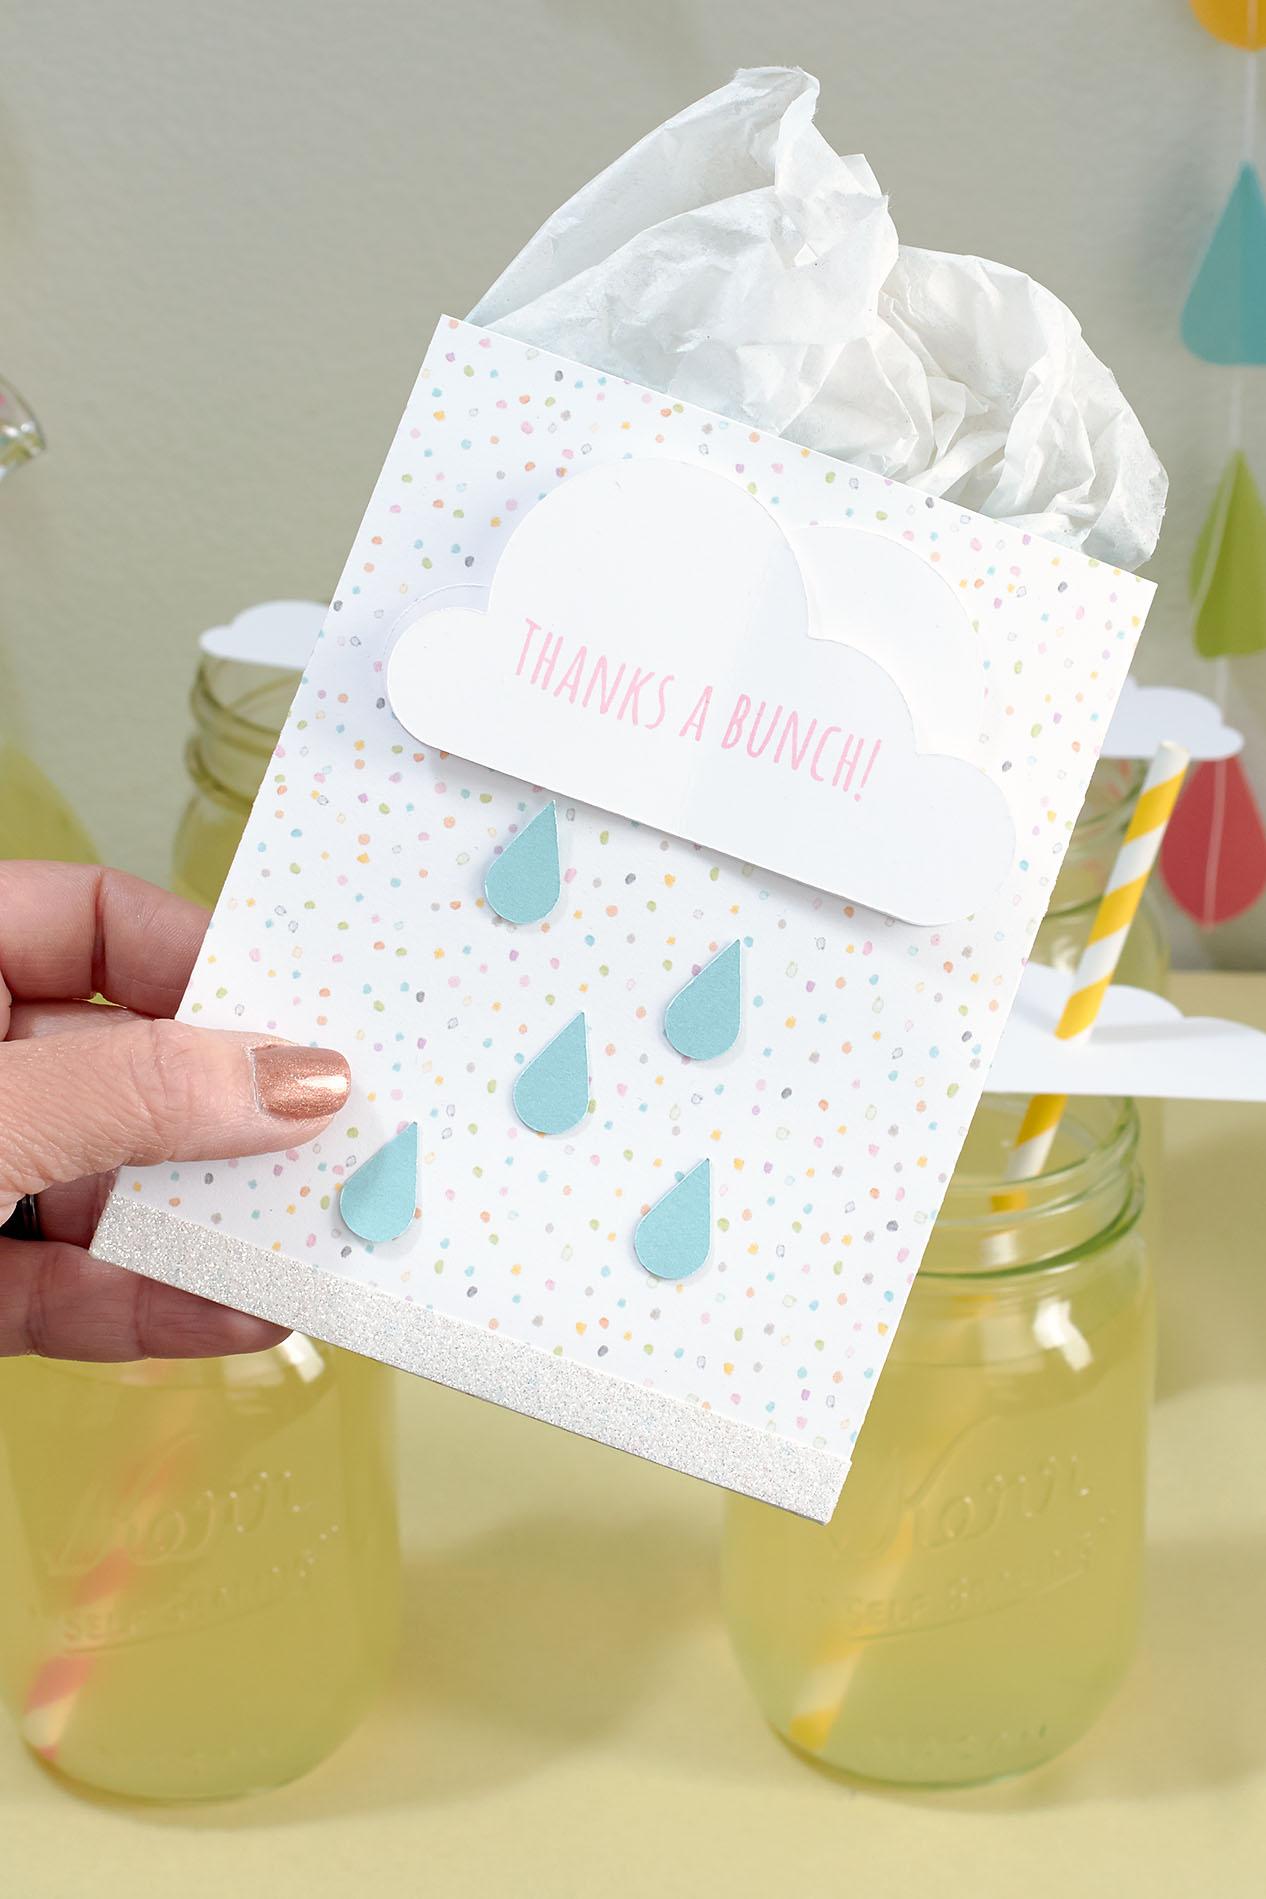 Throw A Shower Themed Baby Shower! #ctmh #closetomyheart #babyshowerideas  #showertheme